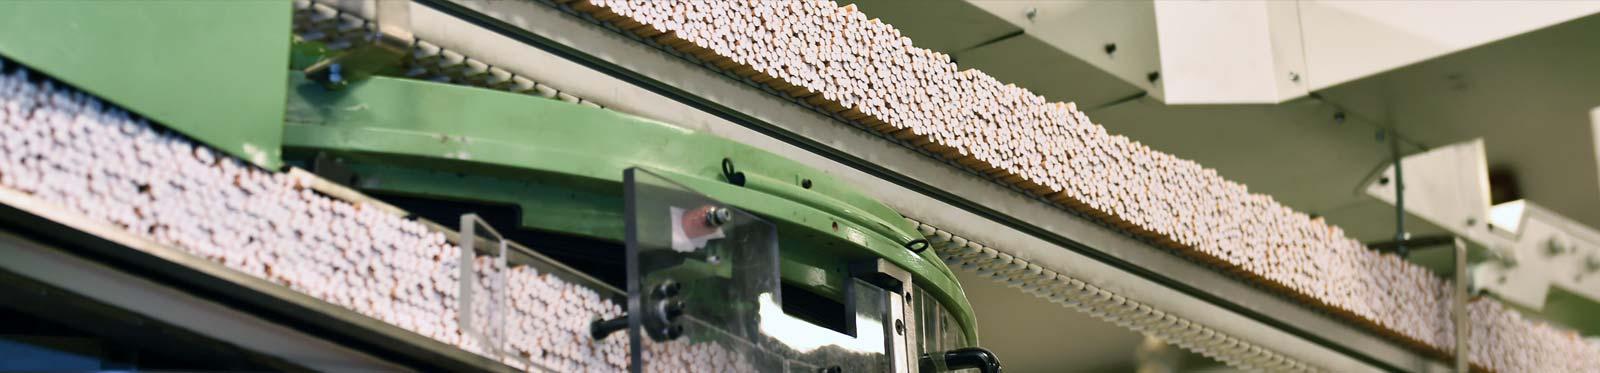 Cigarette Brand Manufacturing Process